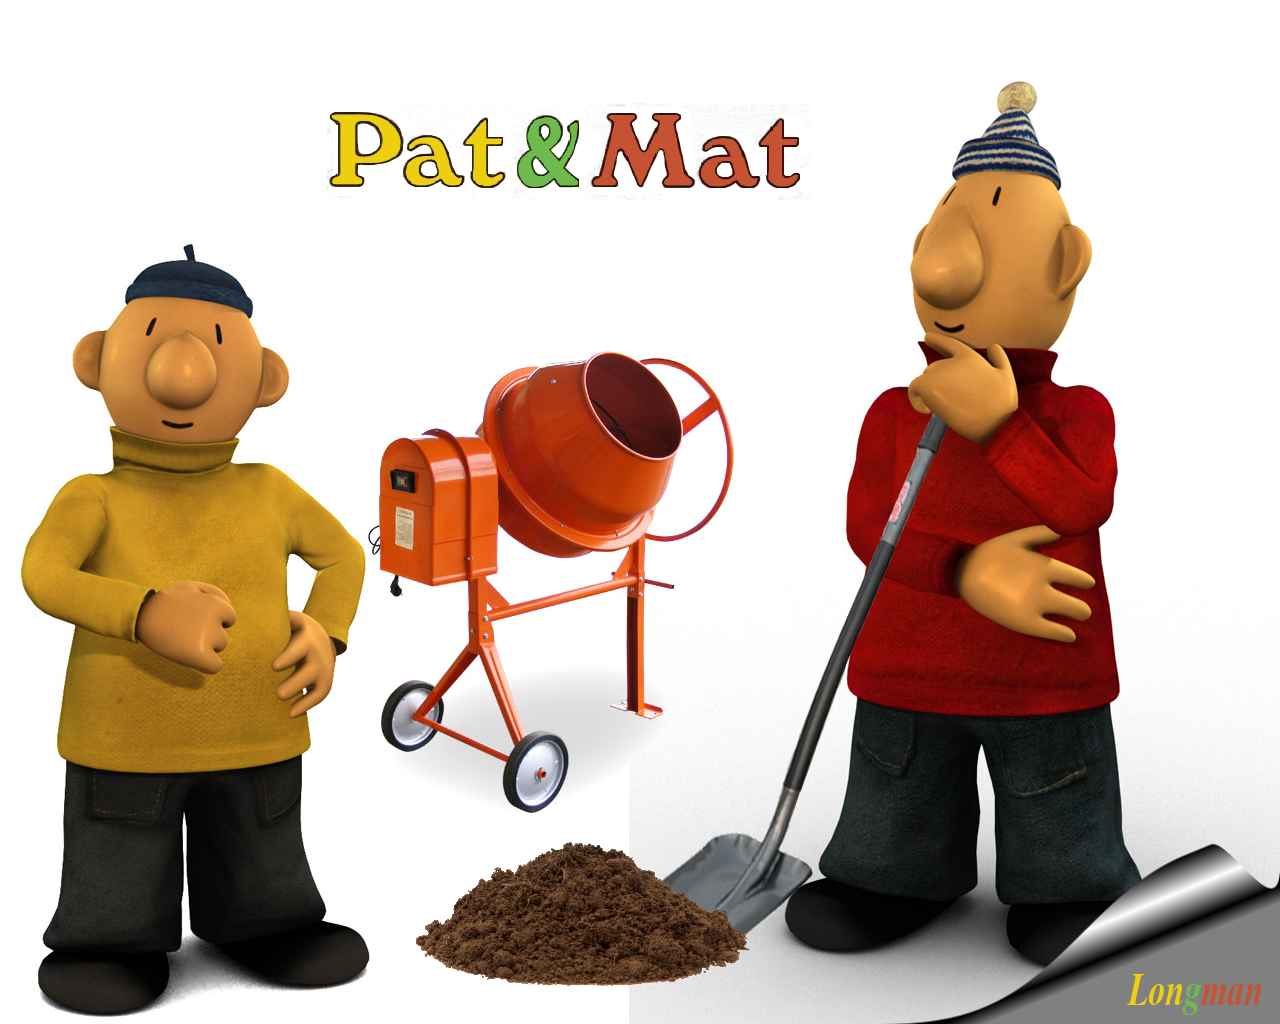 pat and mat images mat and pat HD wallpaper and background photos - Mat PNG HD